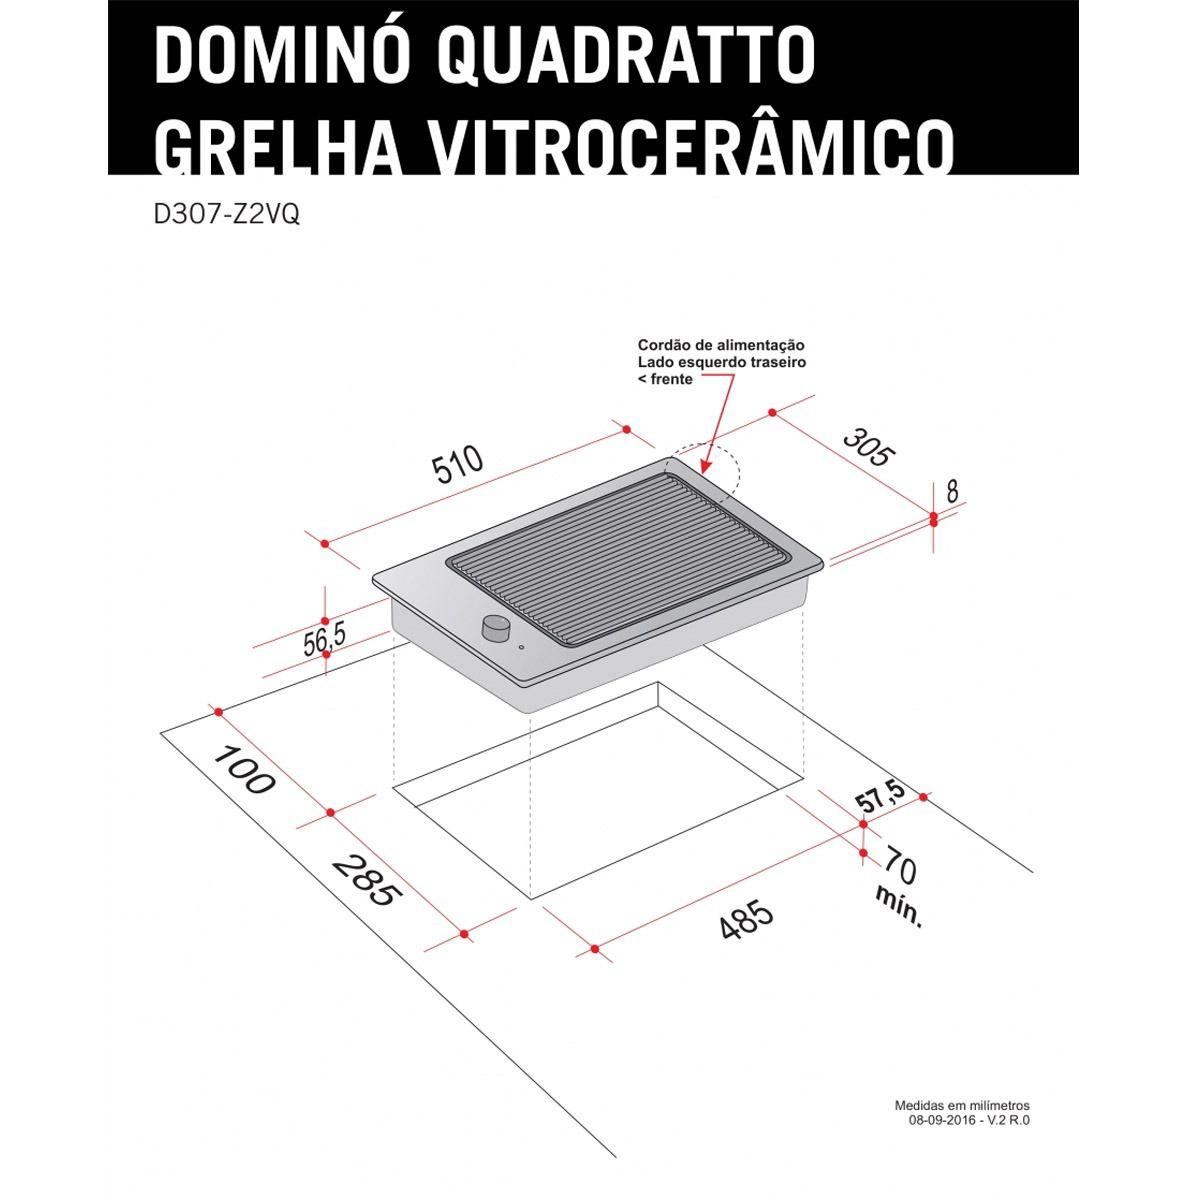 Dominó Elettromec Quadratto Grelha Vitrocerâmico 220V